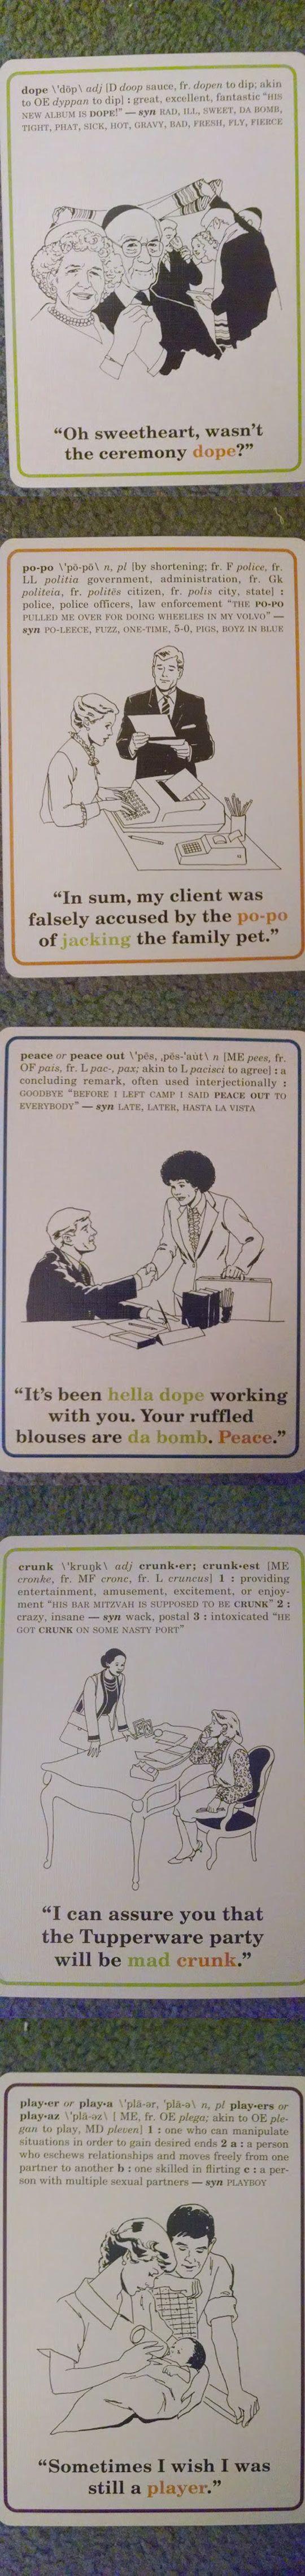 funny-slang-cards-box-words-hip-dope